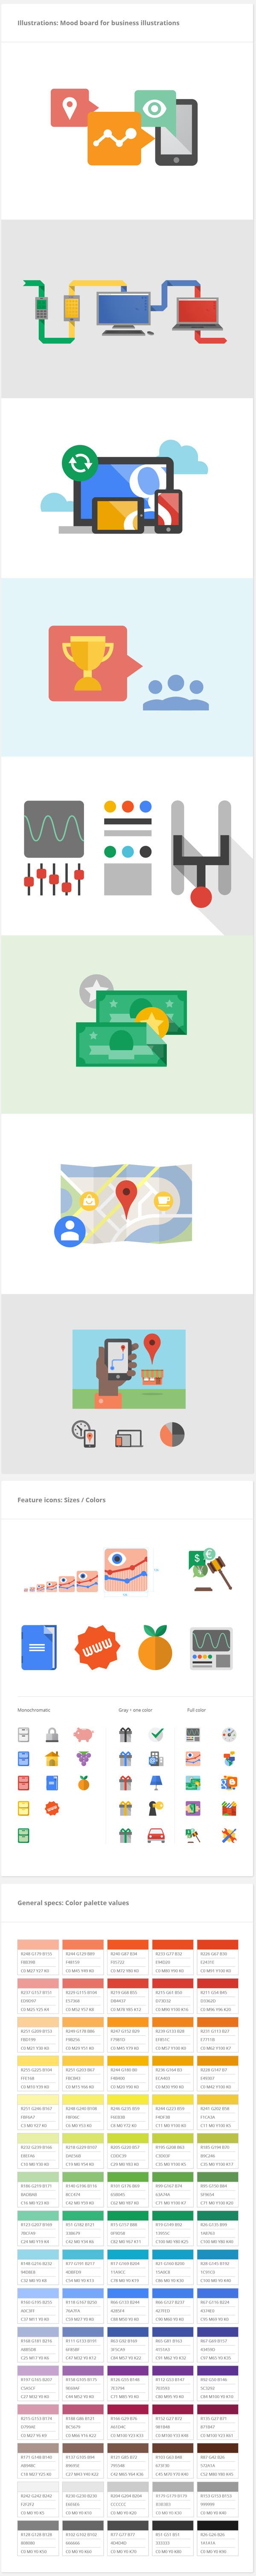 Google Visual Assets Guidelines Part 2 on Behance #google